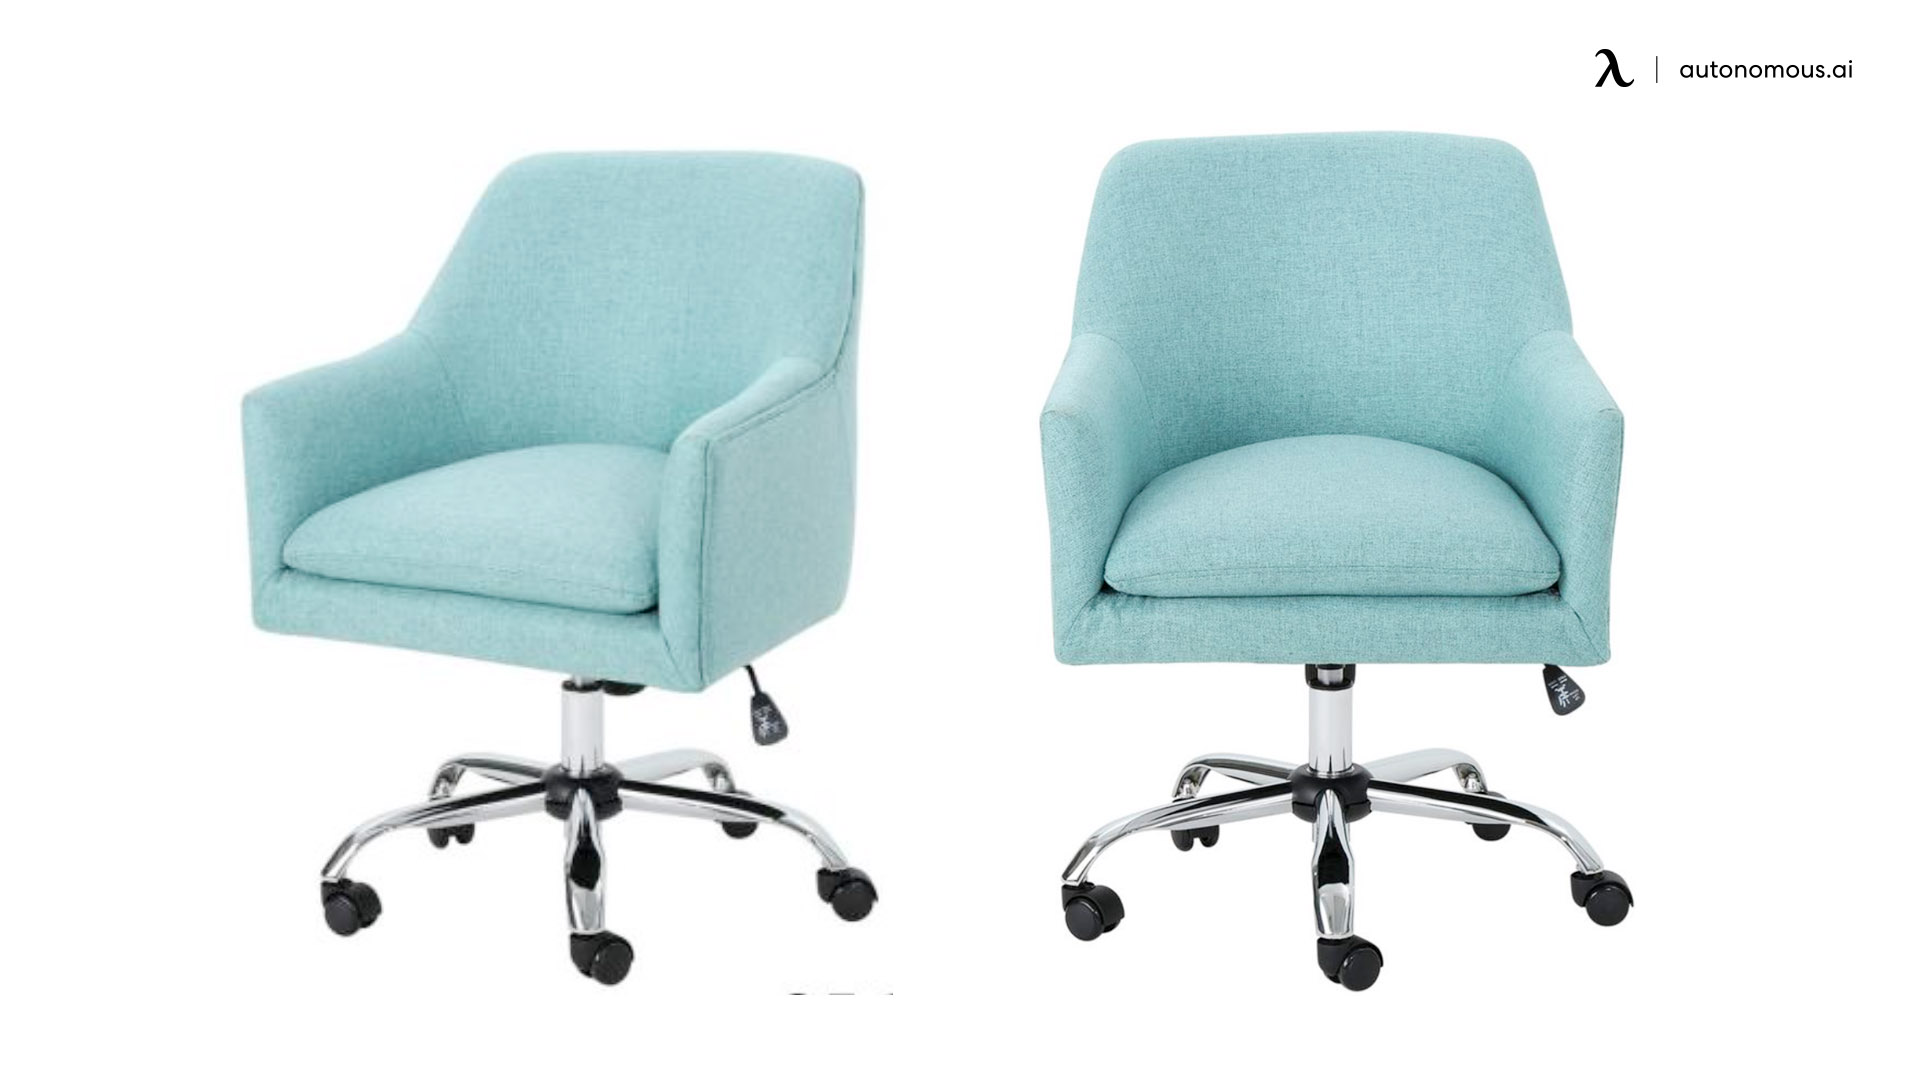 Johnson Mid-Century Modern Home Office Chair